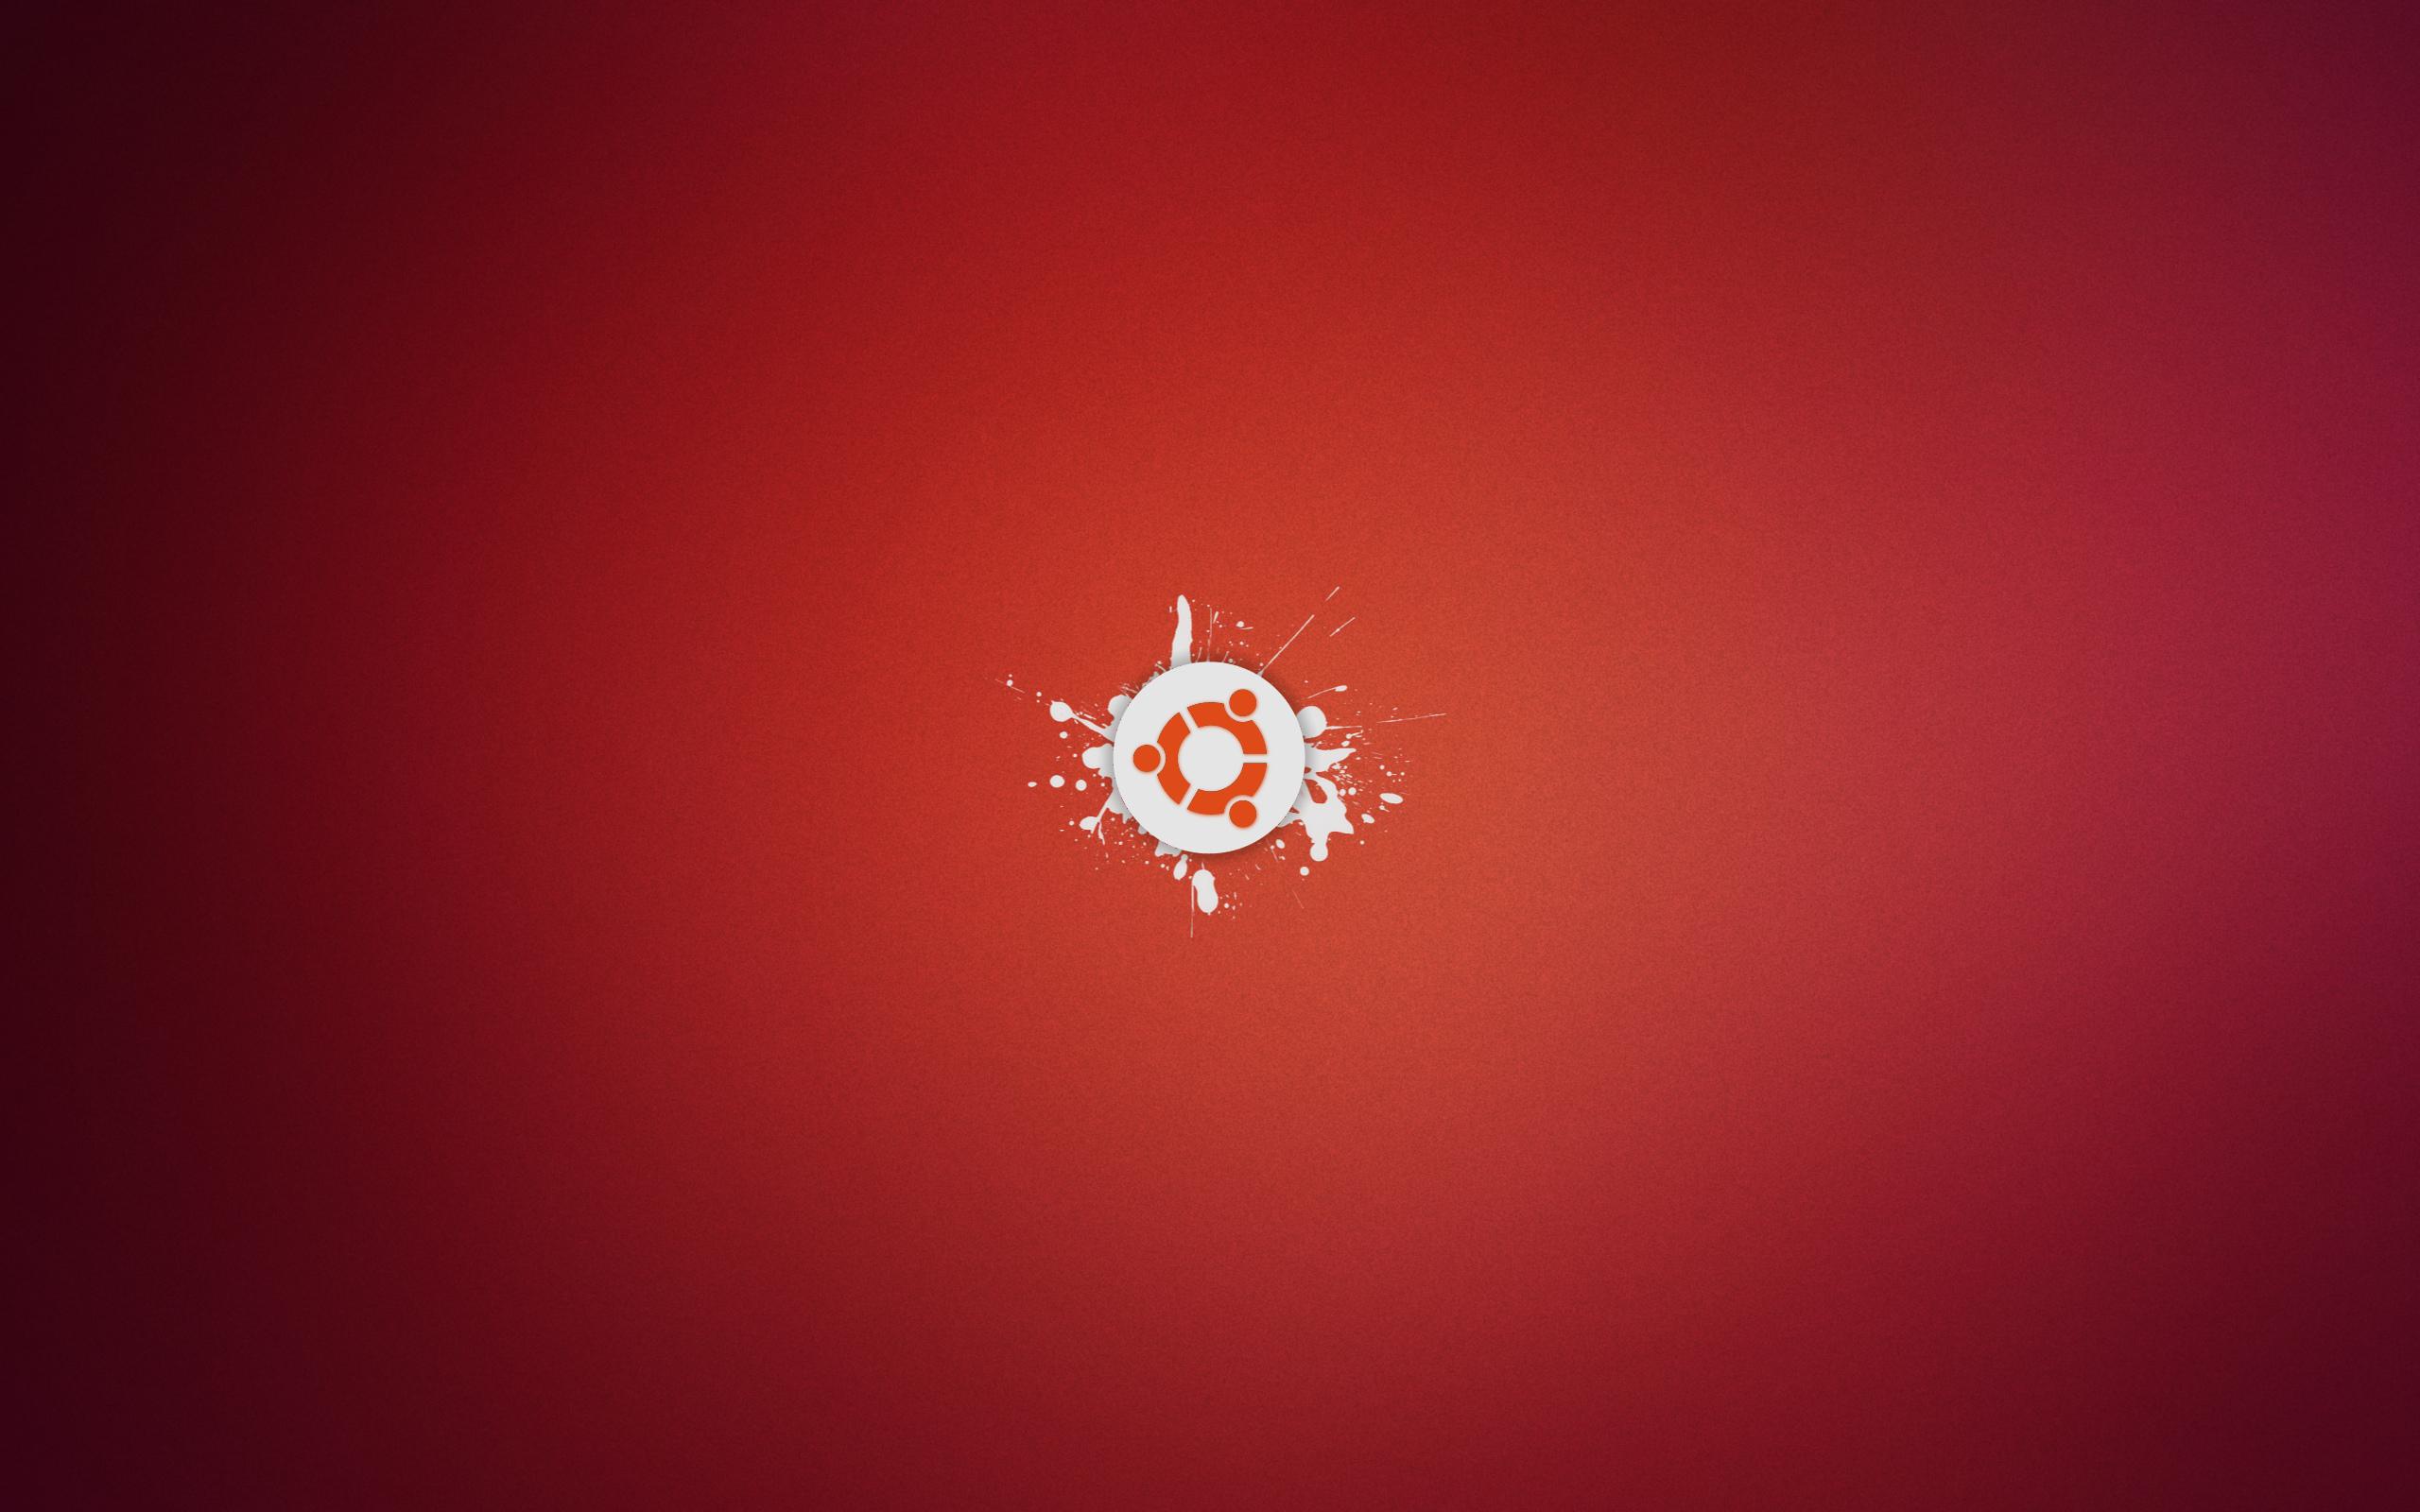 Best Ubuntu Wallpapers 2015 Best Auto Reviews 2560x1600